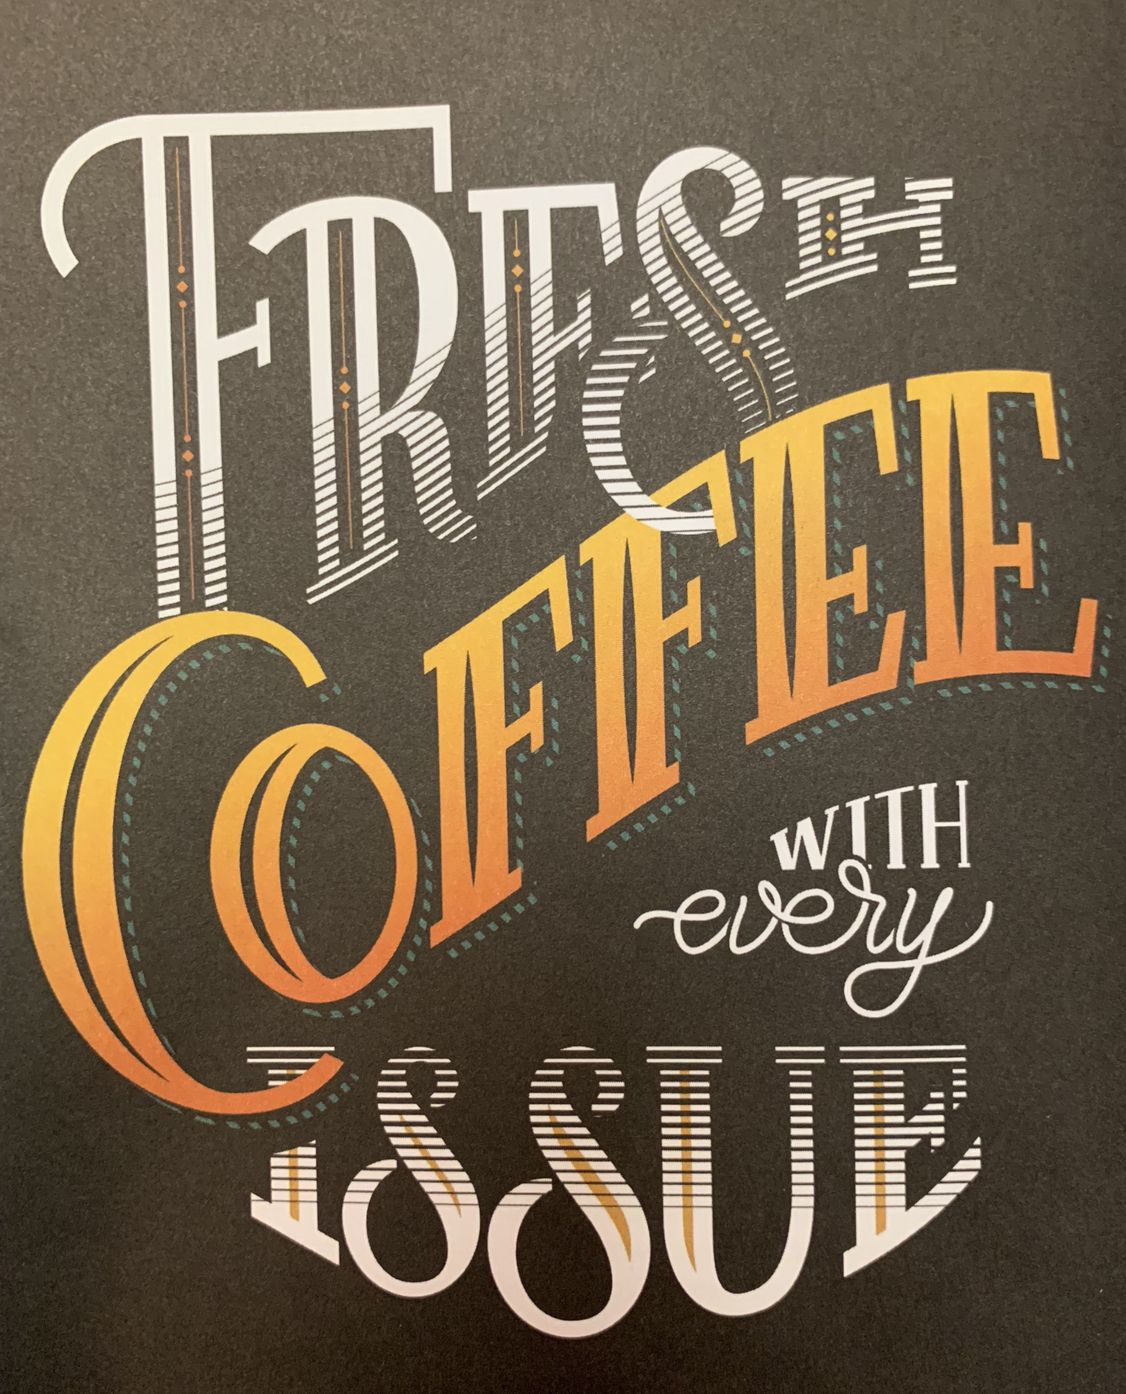 Standart coffee